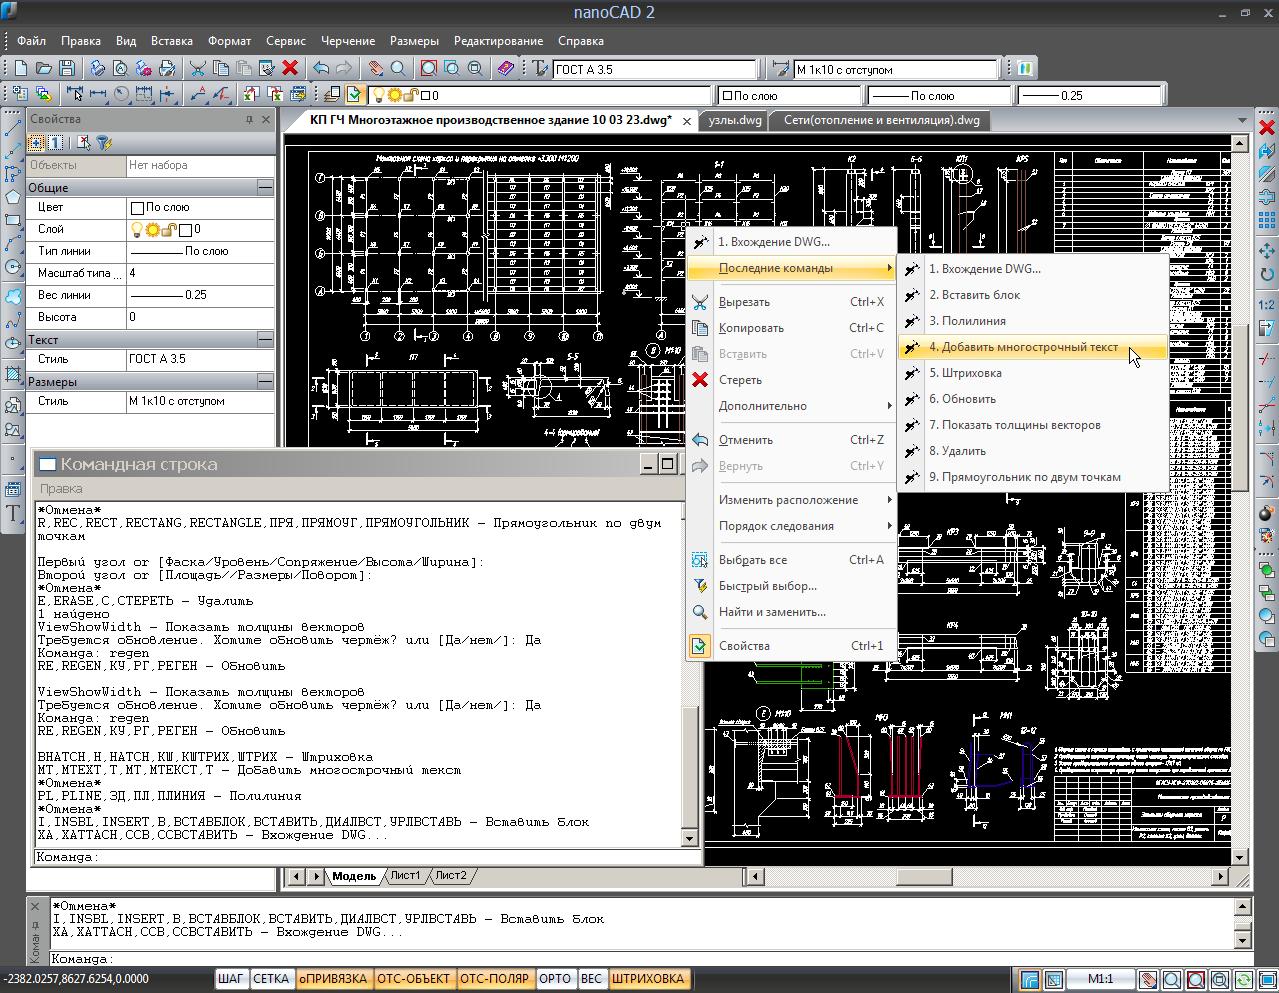 Интерфейс отечественной САПР <i>Nano CAD</i>.